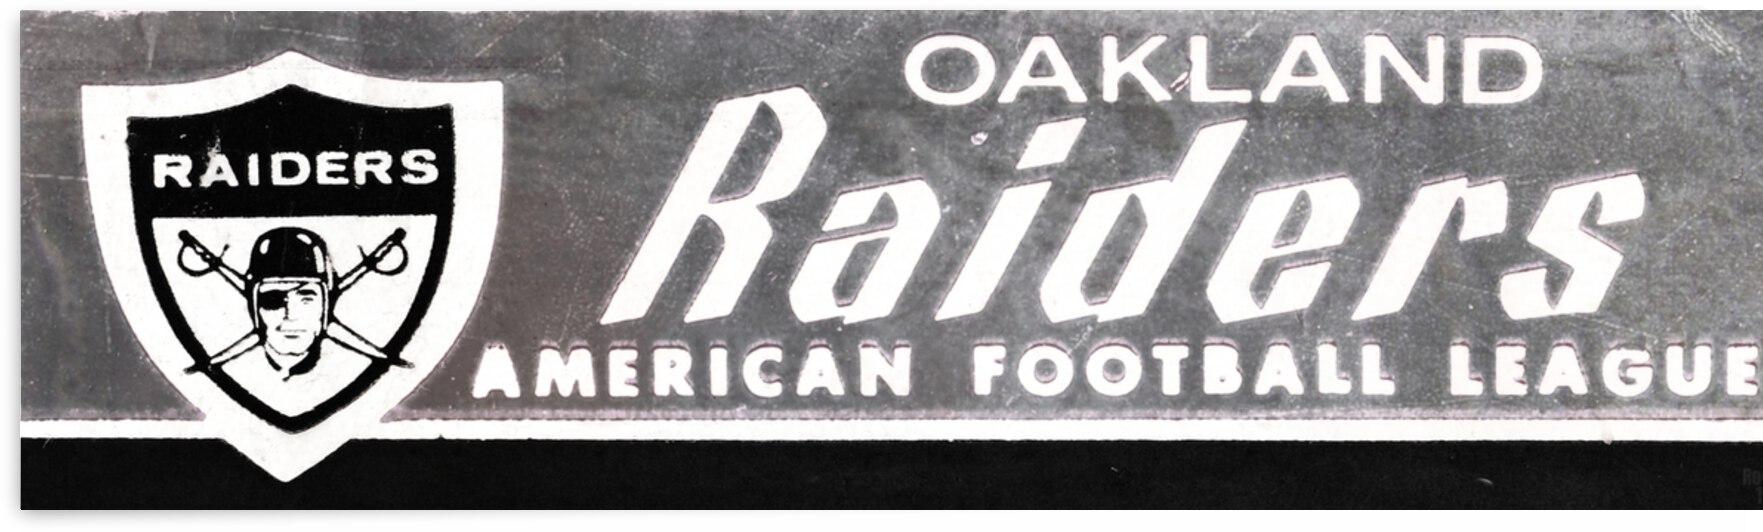 1969 Oakland Raiders Ticket Stub Remix Art by Row One Brand